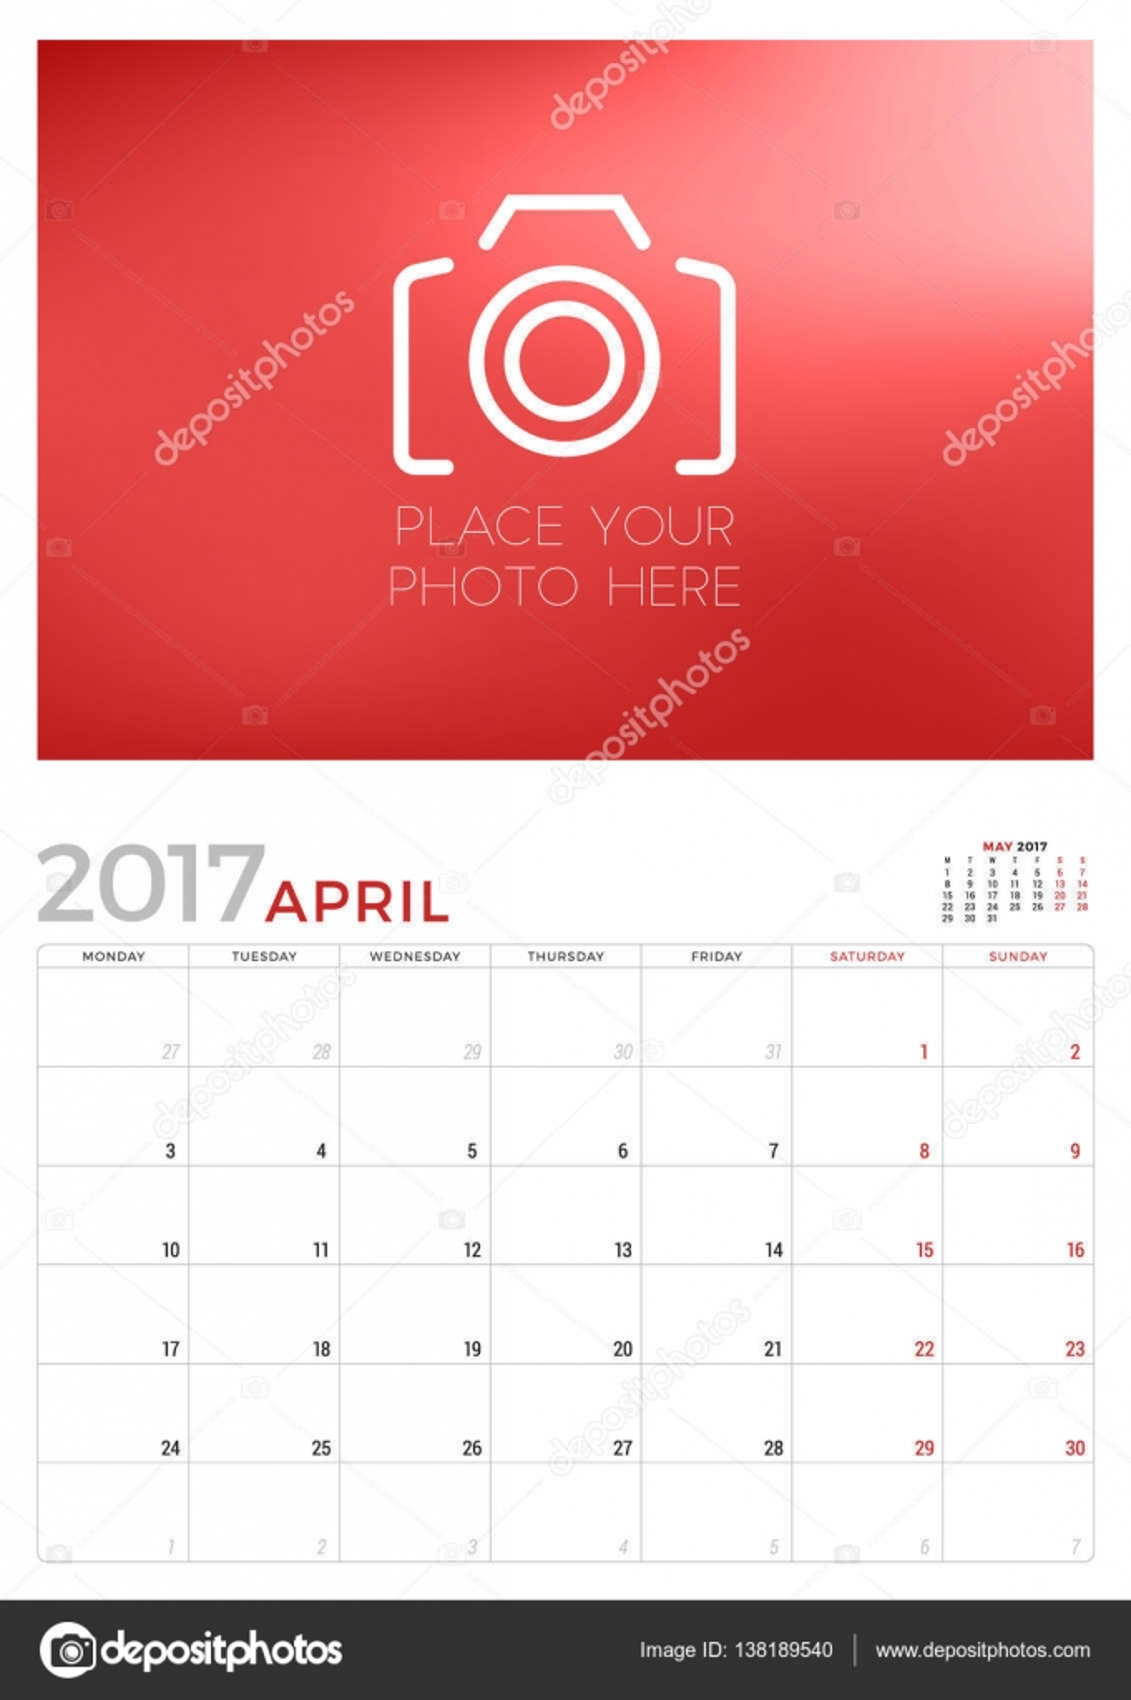 Wall Calendar Planner Template For April 2017 Week Starts Monday